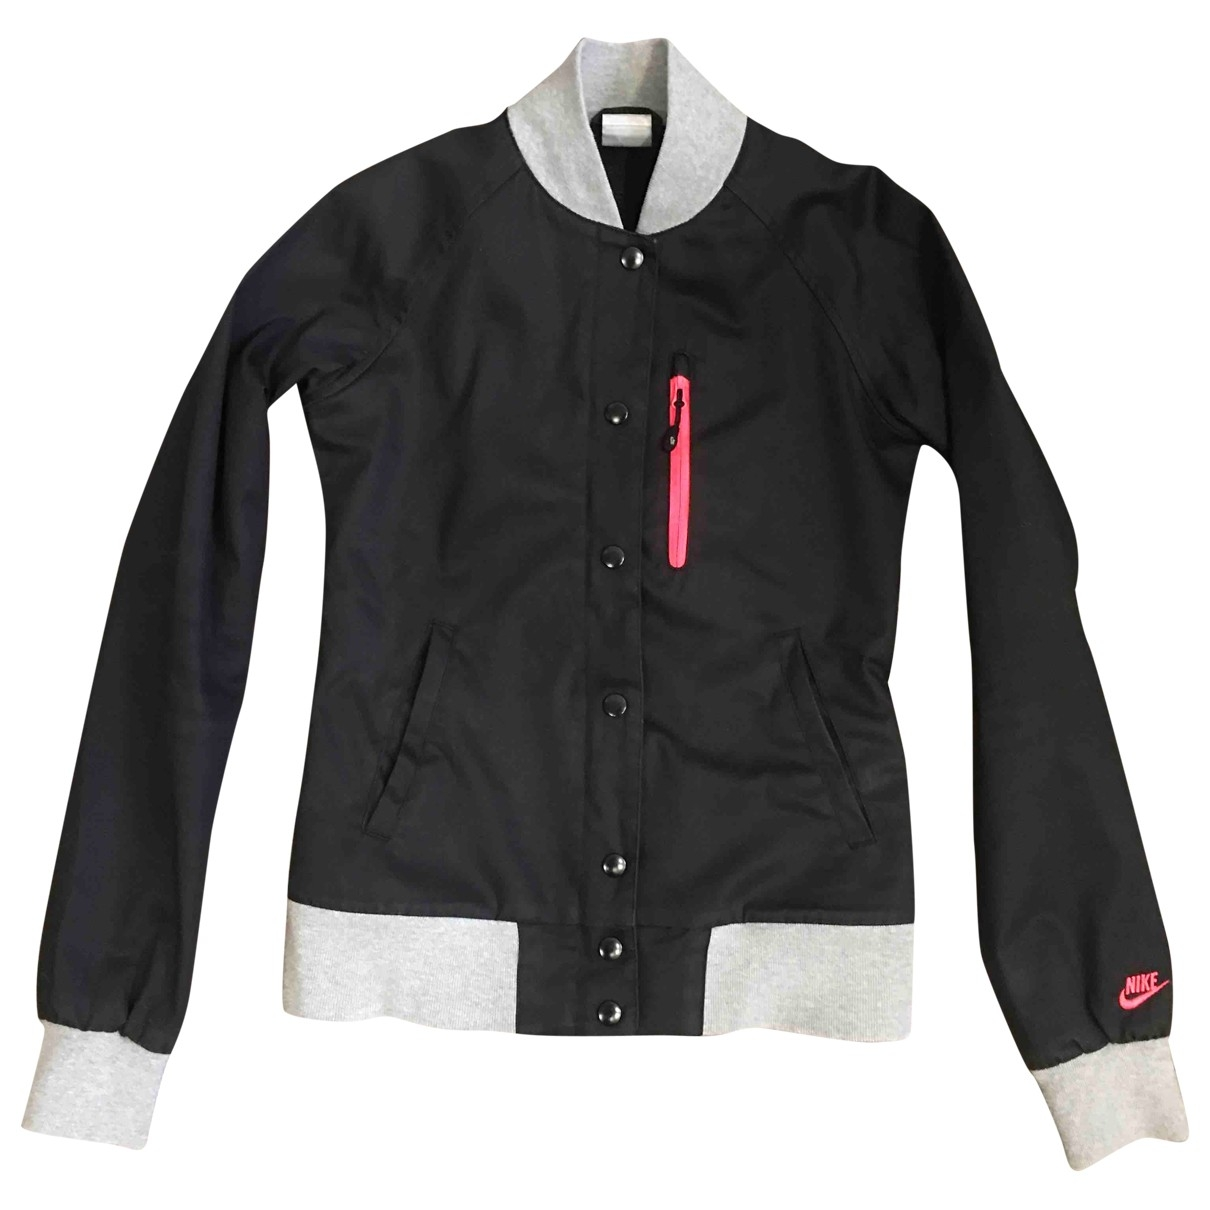 Nike \N Black Cotton jacket for Women XS International